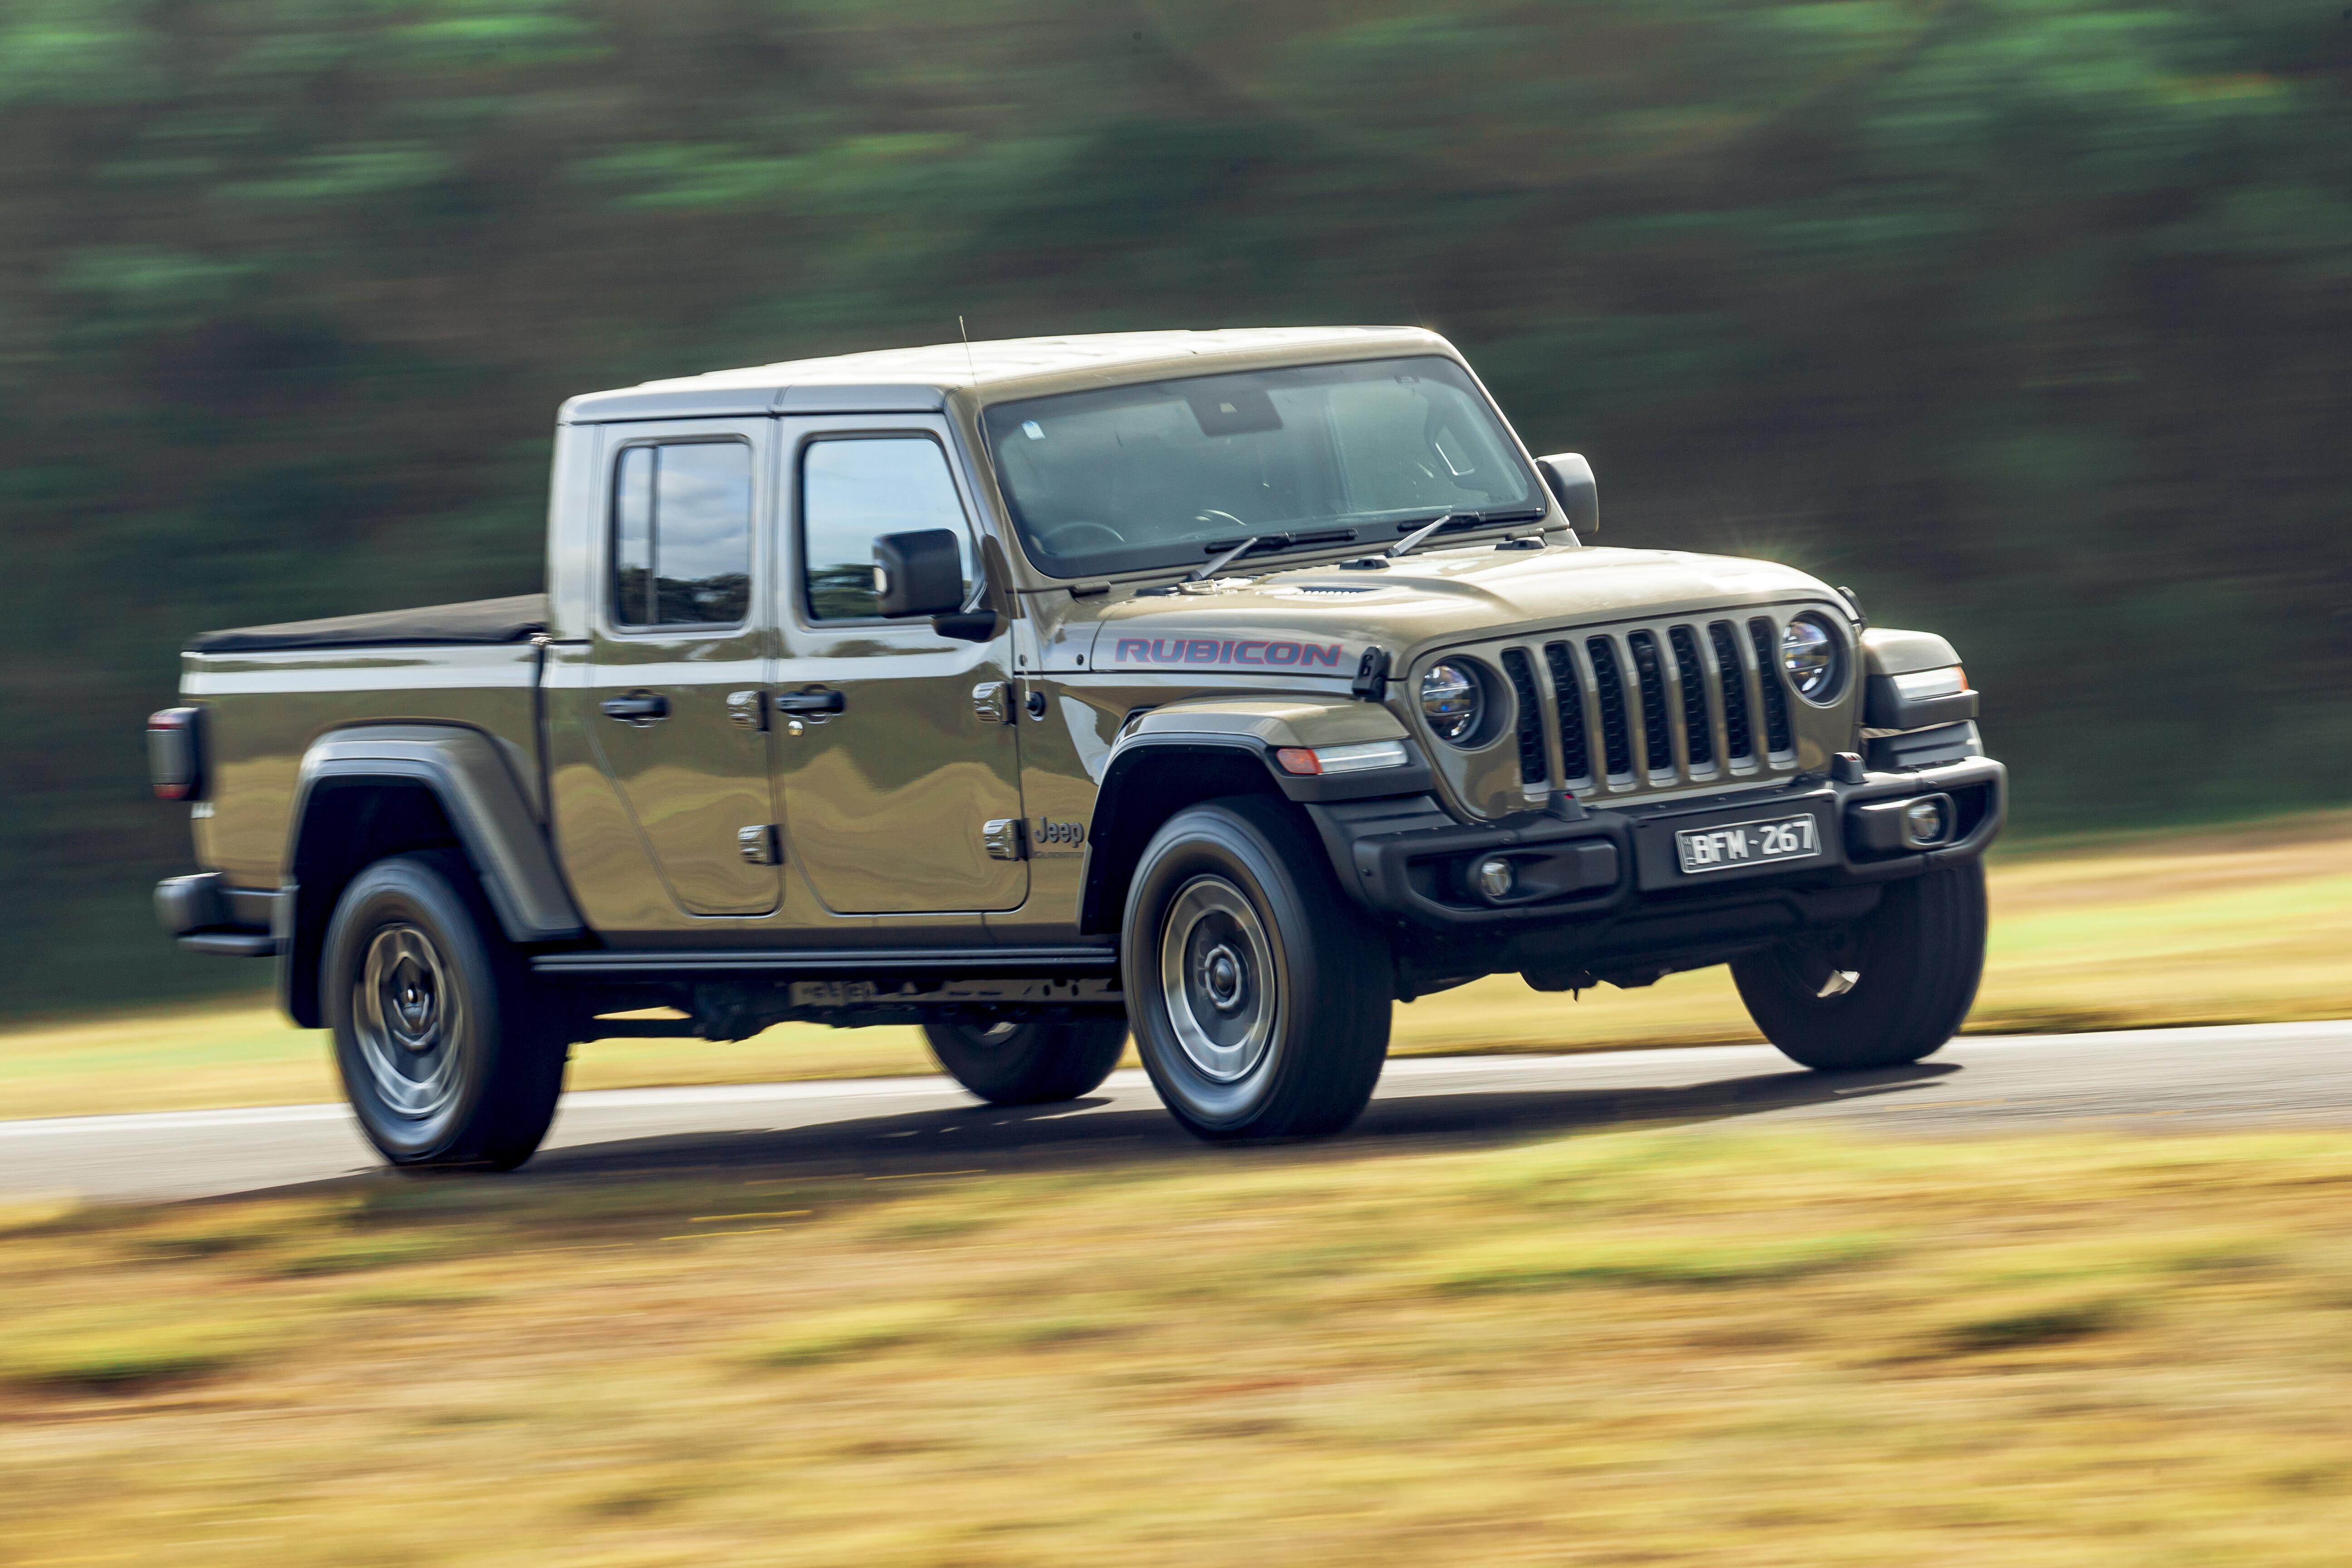 4 X 4 Australia Comparisons 2021 May 21 Jeep Gladiator On Road Test